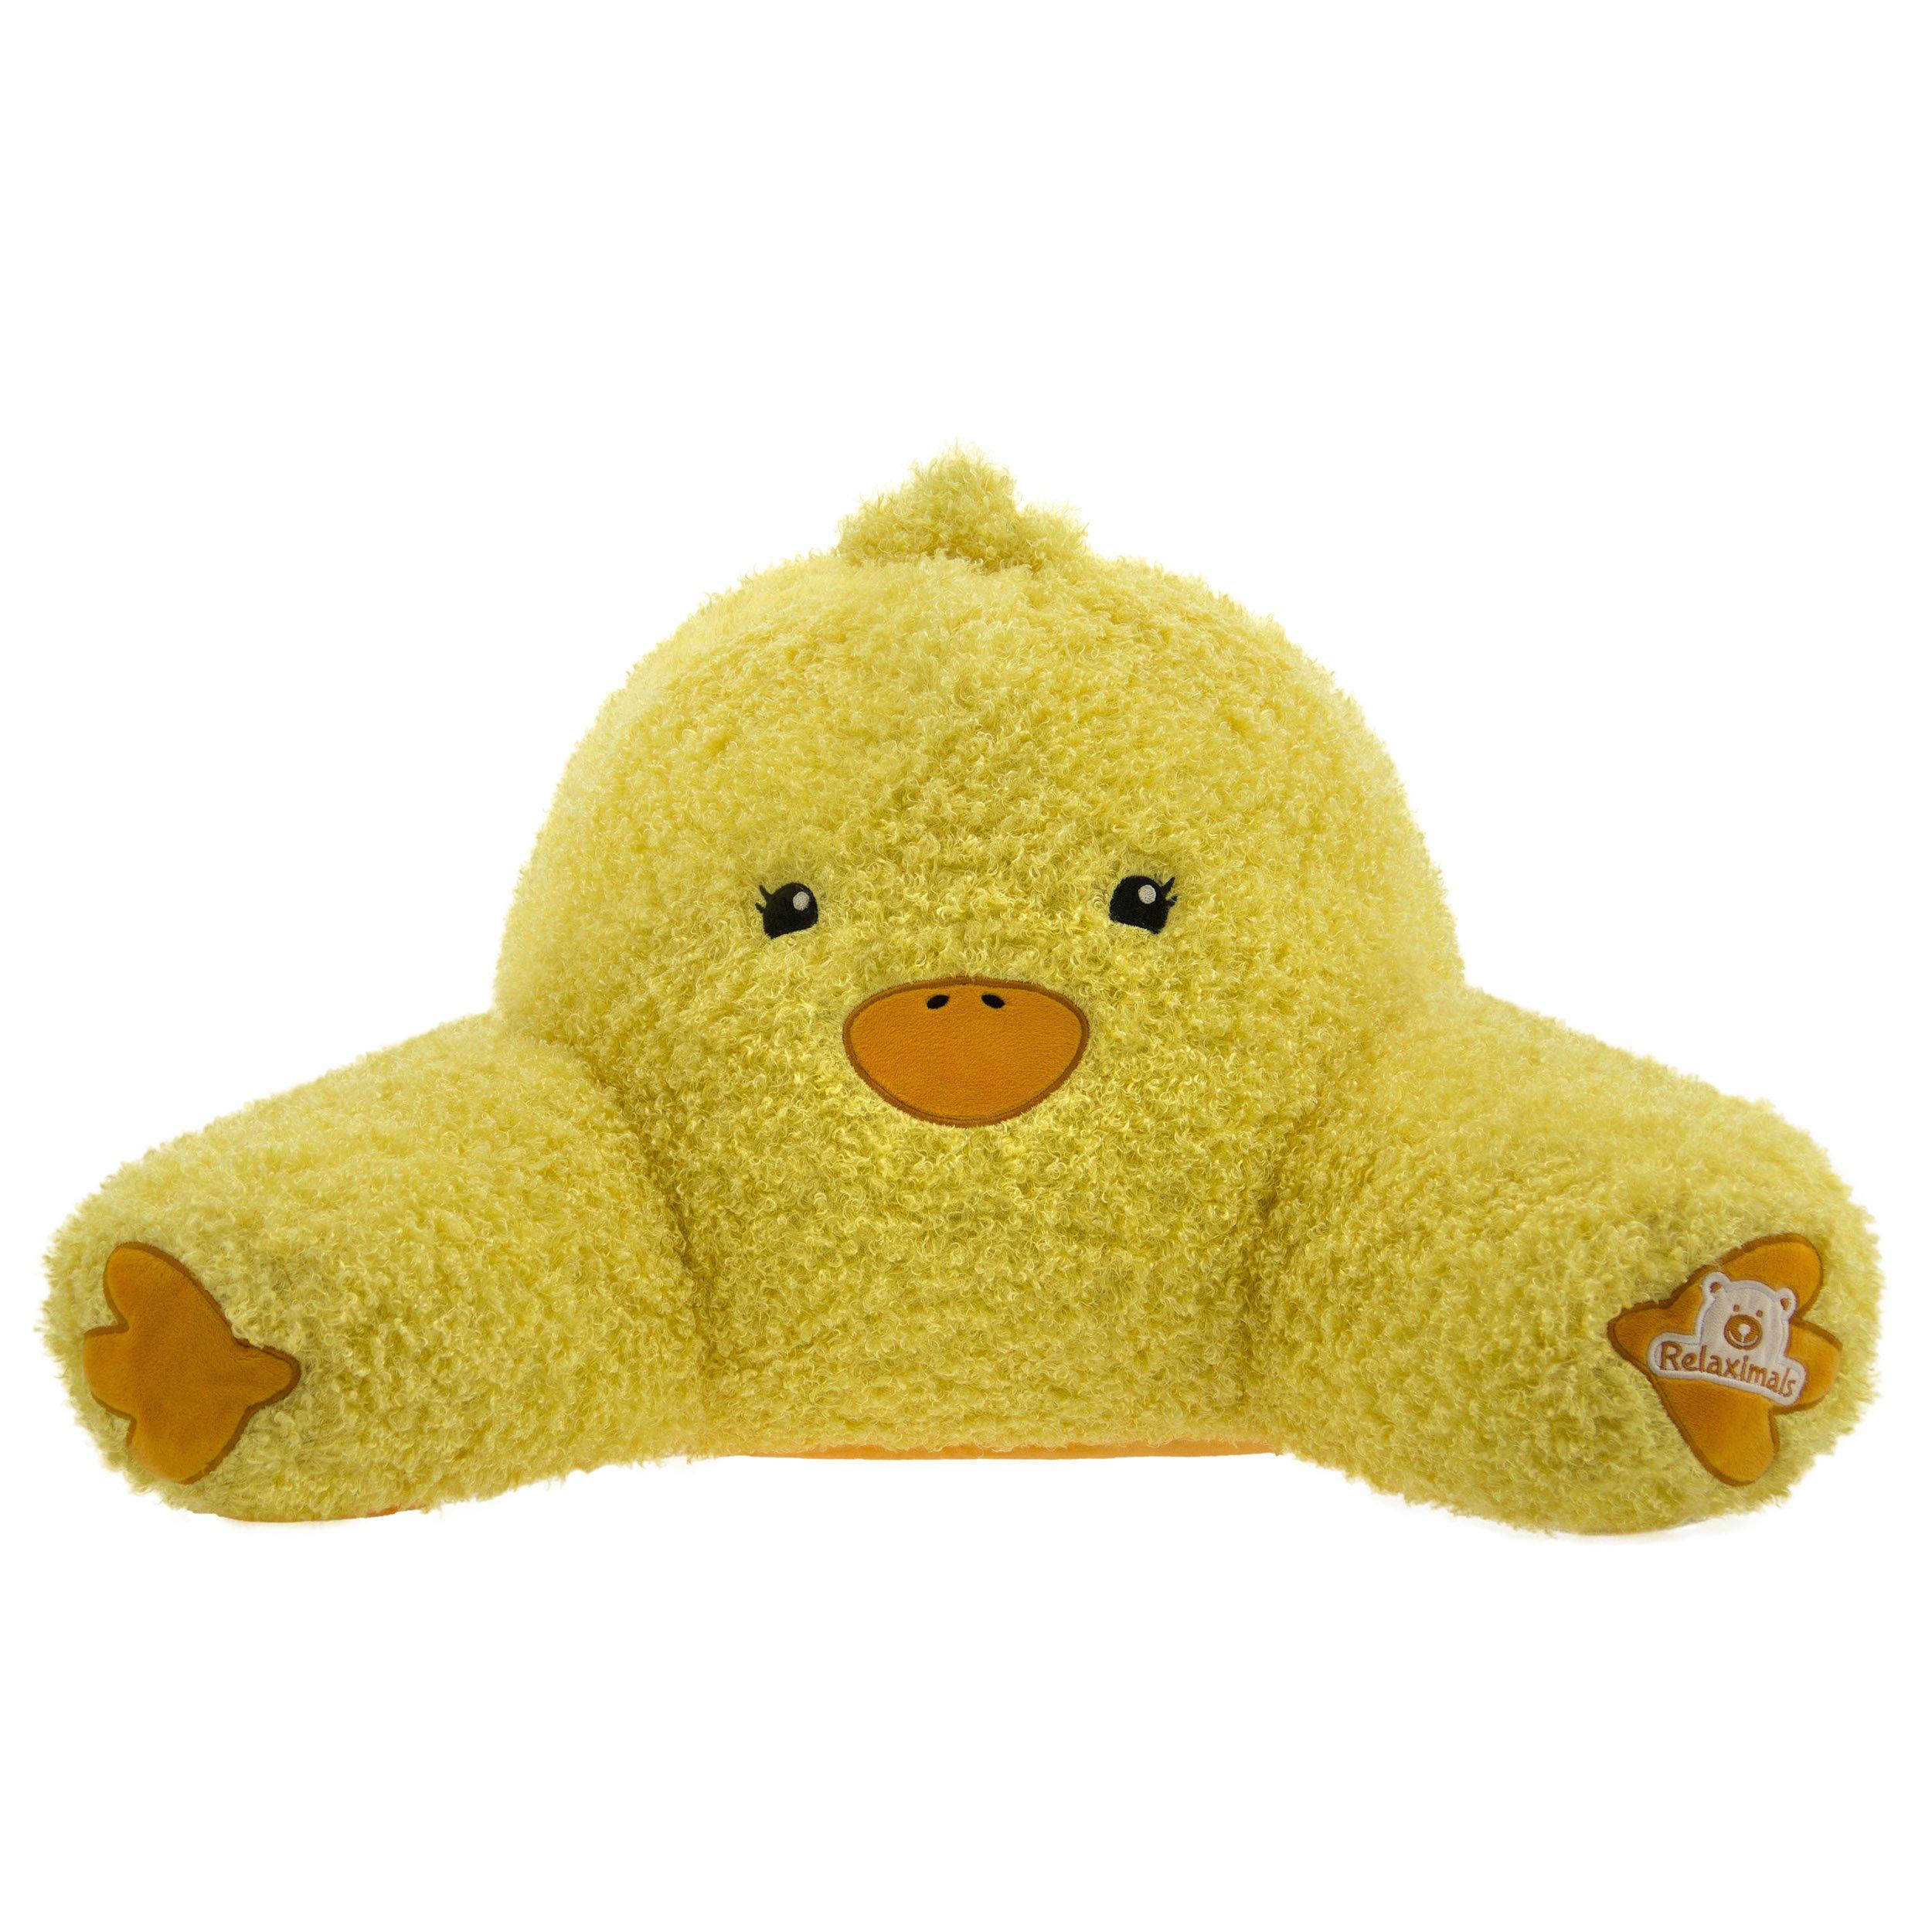 Relaximals Baby Chicken Kids Reading Pillow